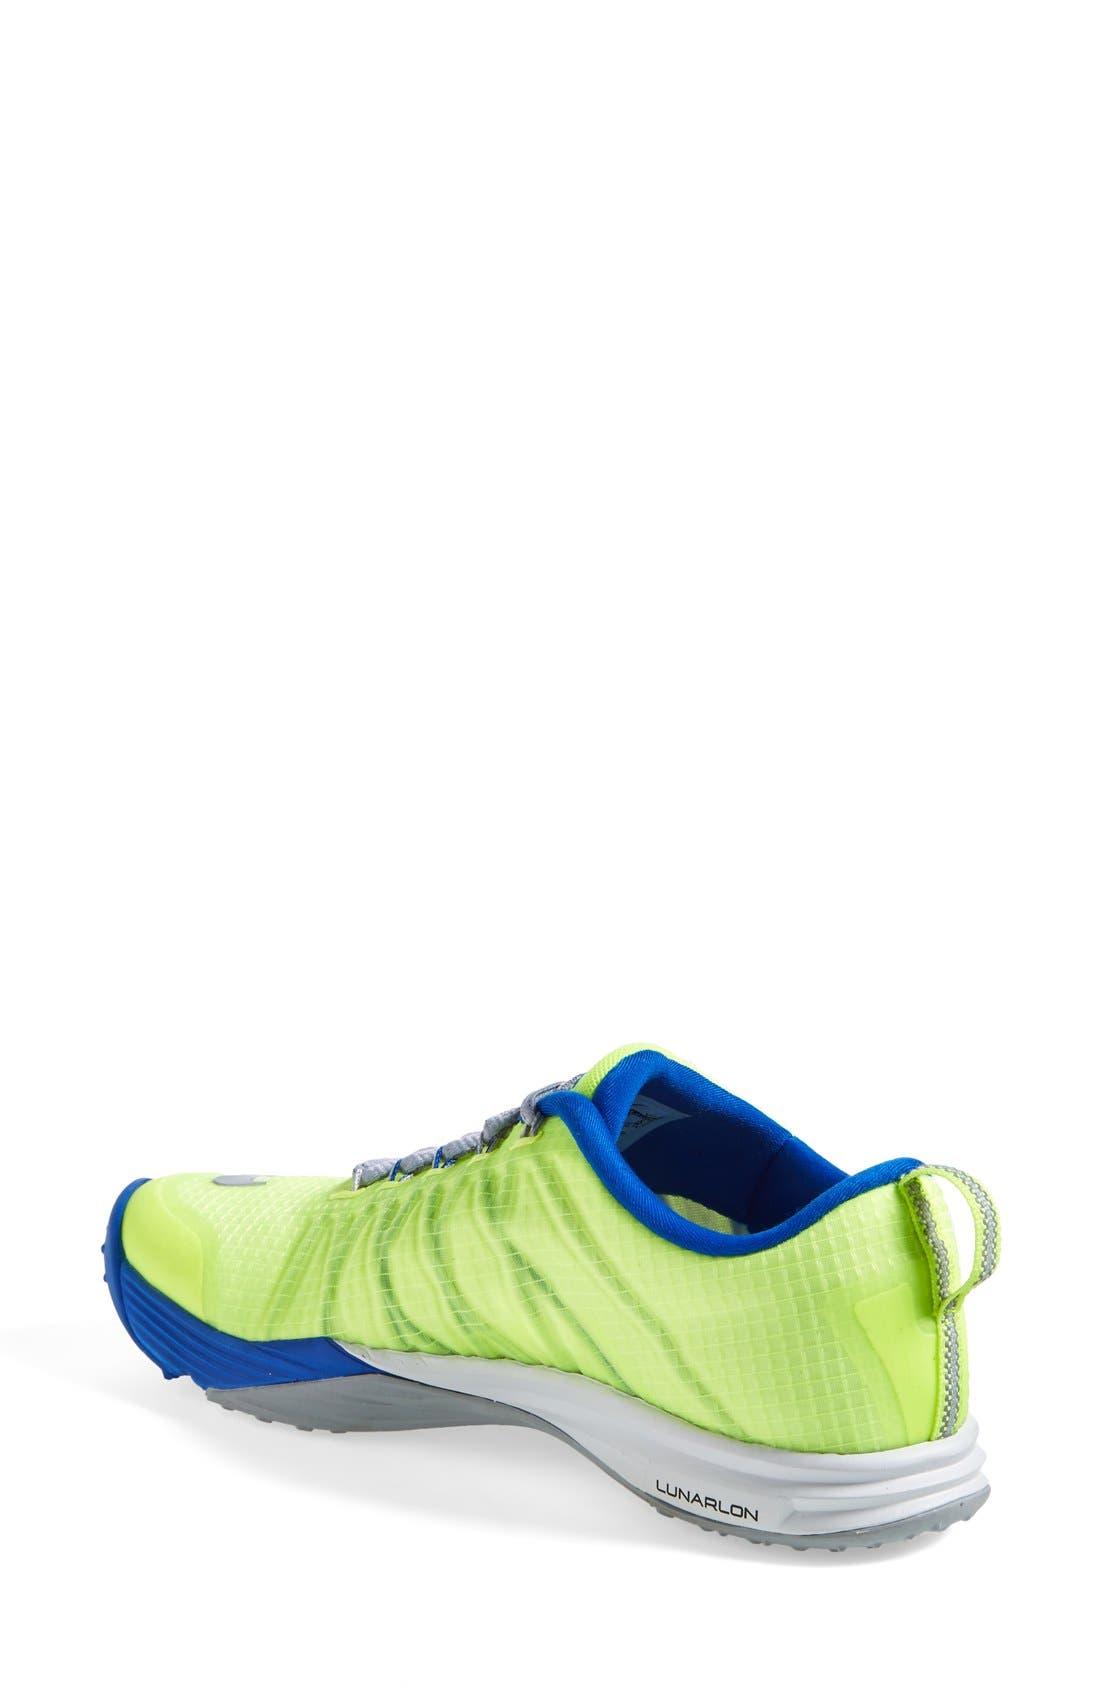 Alternate Image 2  - Nike 'Lunar Cross Element' Training Shoe (Women)